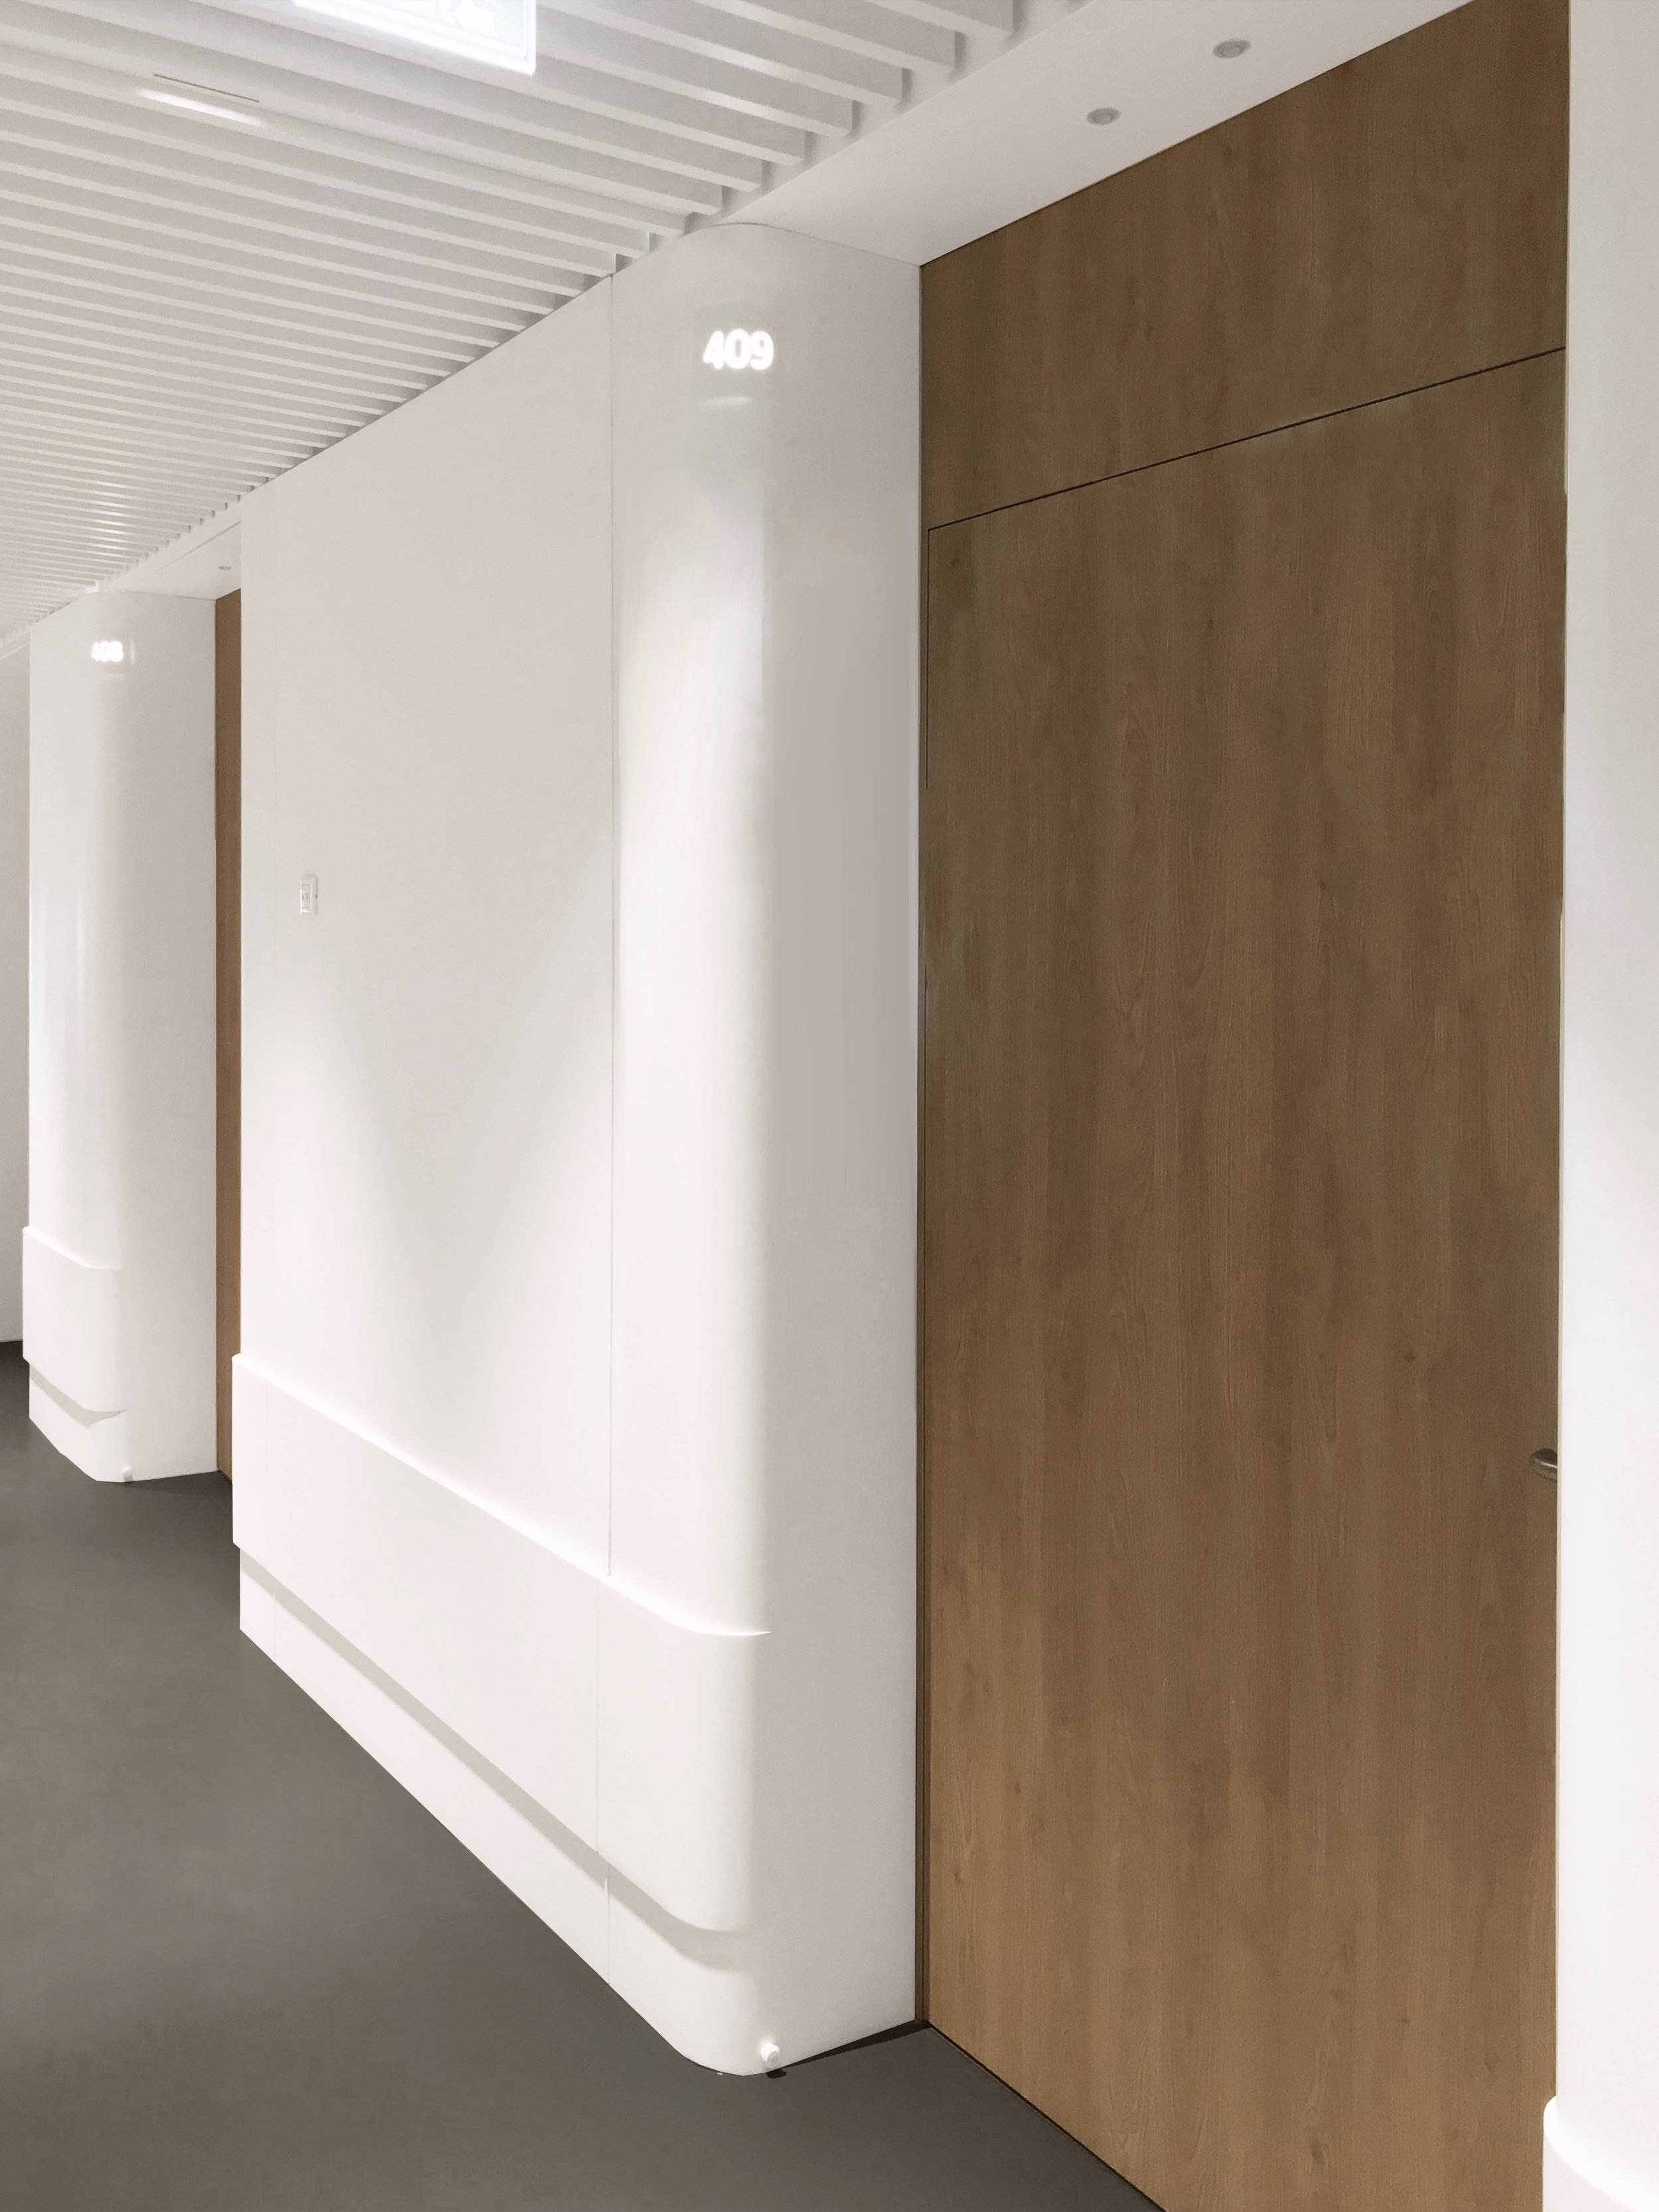 Salvator Mundi International Hospital - fourth floor corridor -